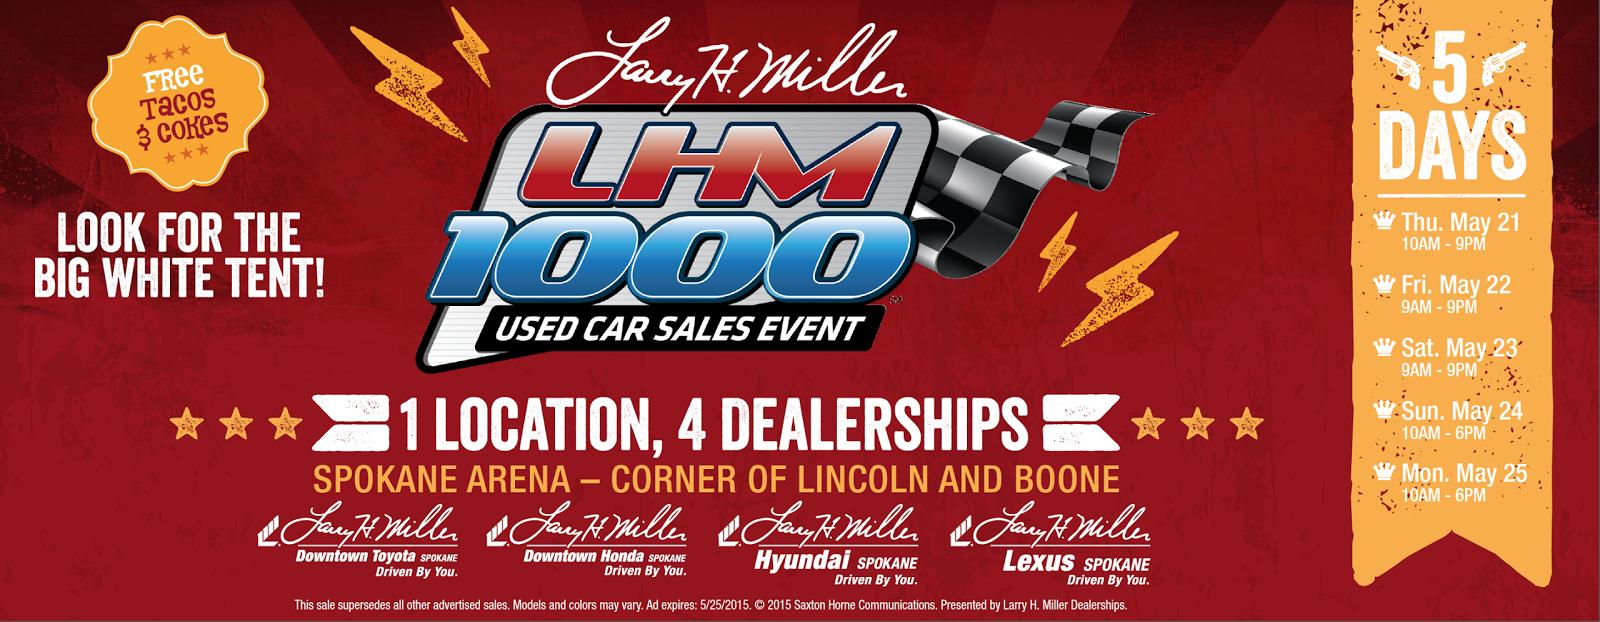 Lhm Hyundai Spokane >> LHM 1000 Used Car Sales Event | Larry H. Miller Hyundai Spokane | Larry H. Miller Hyundai Spokane